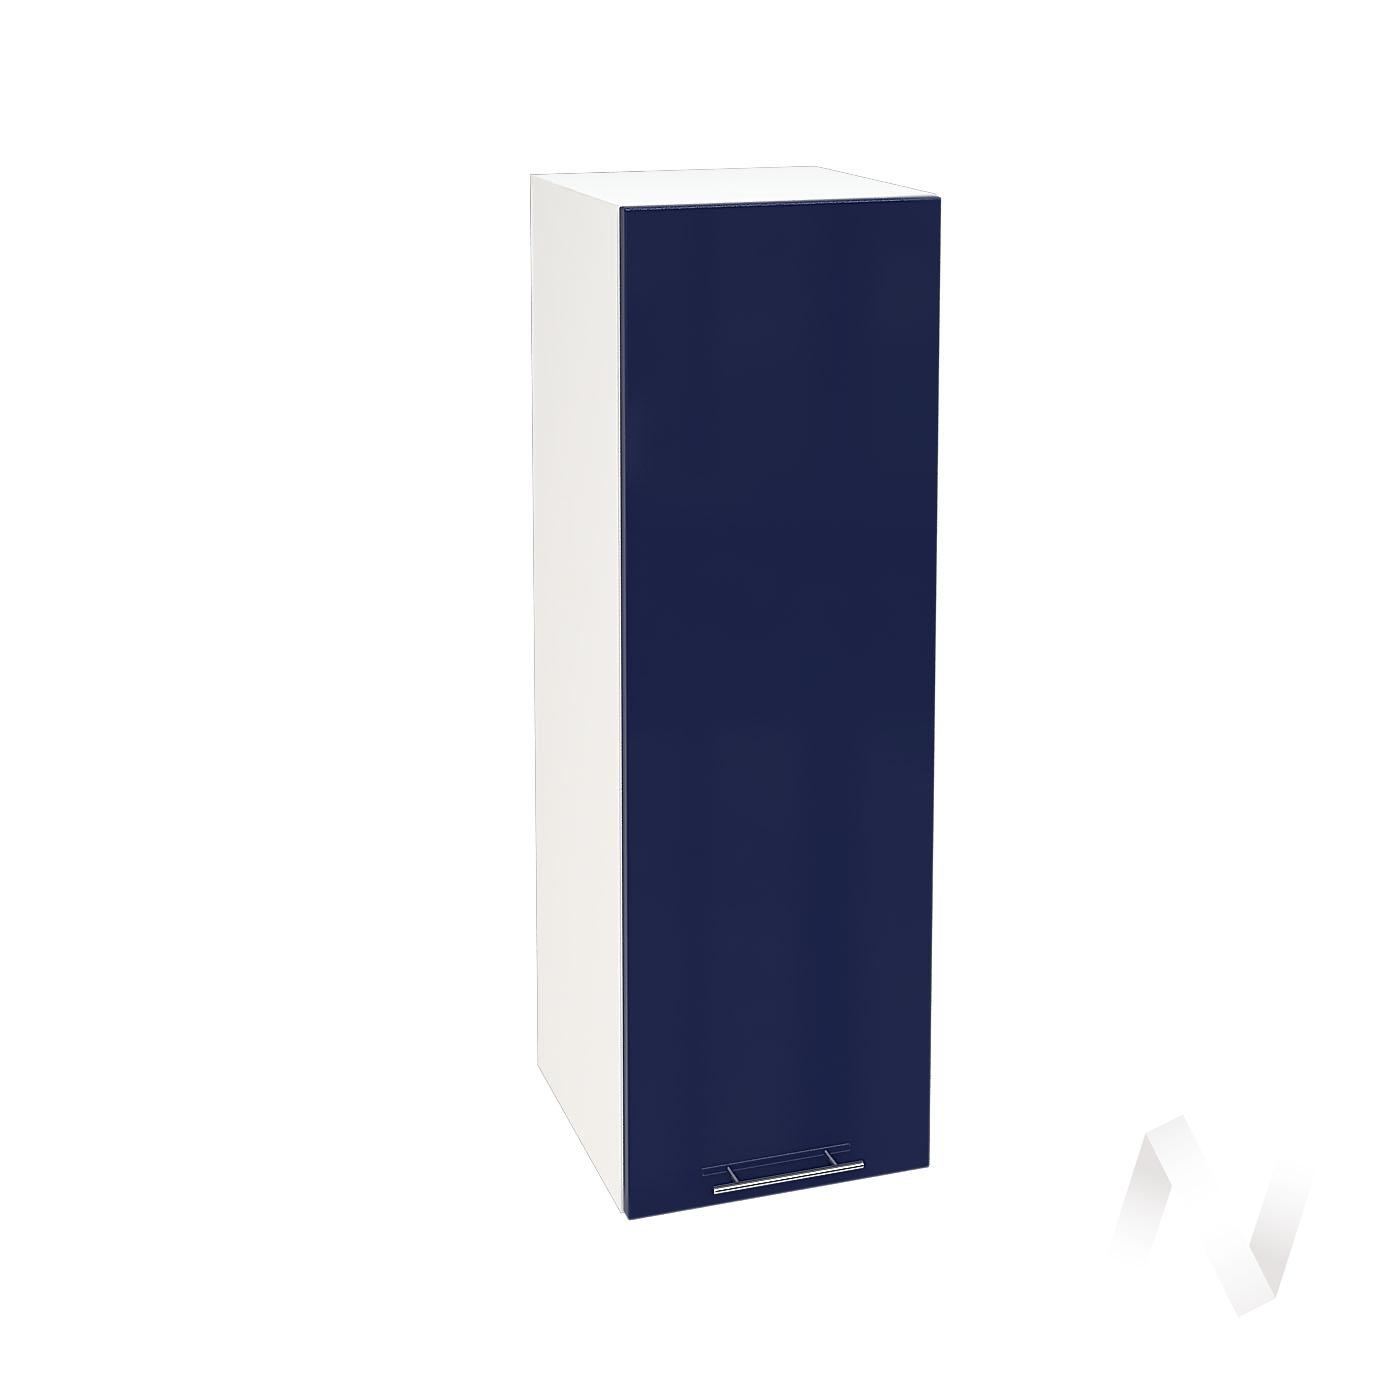 "Кухня ""Валерия-М"": Шкаф верхний 309, ШВ 309 (Синий глянец/корпус белый)"